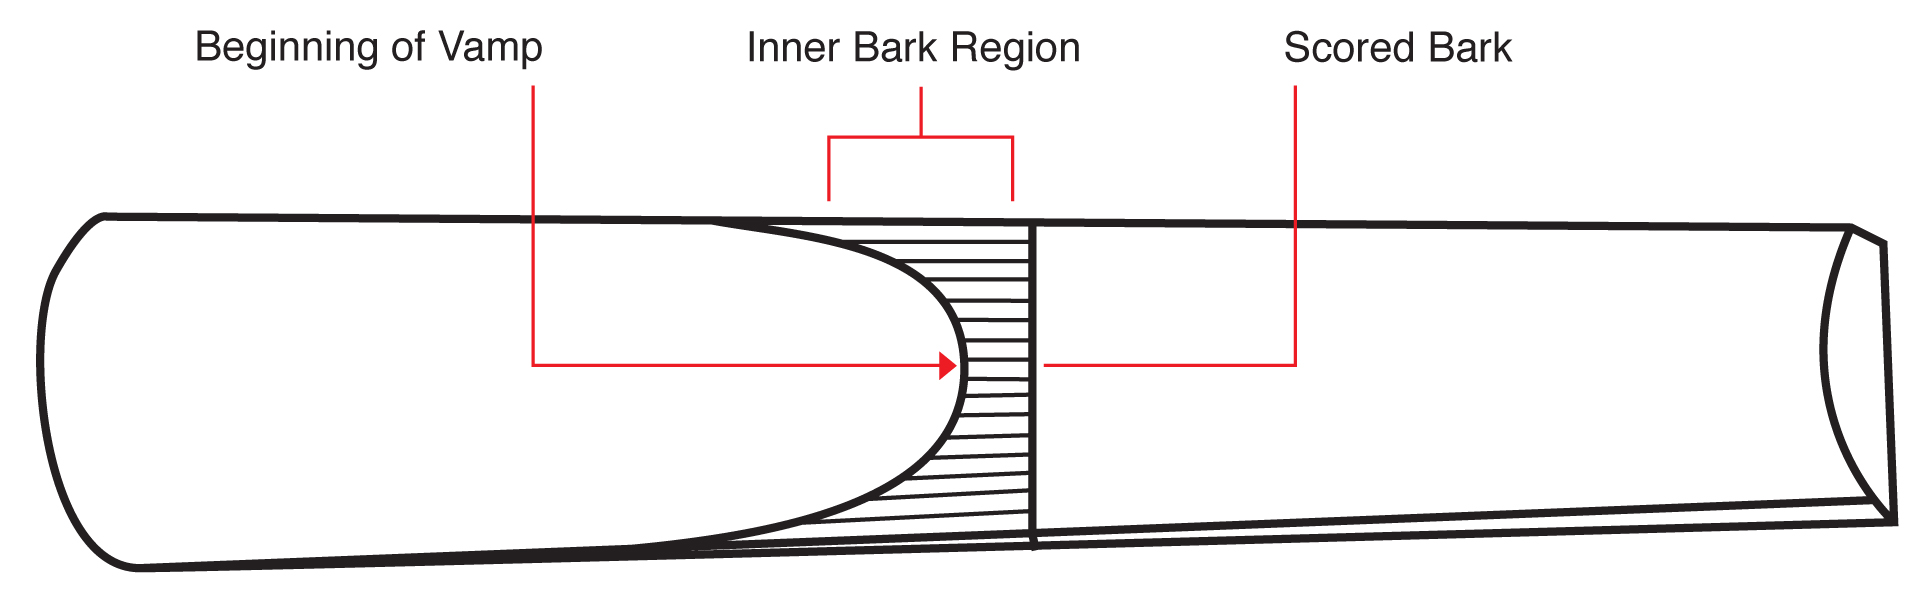 hight resolution of vamp length ranges